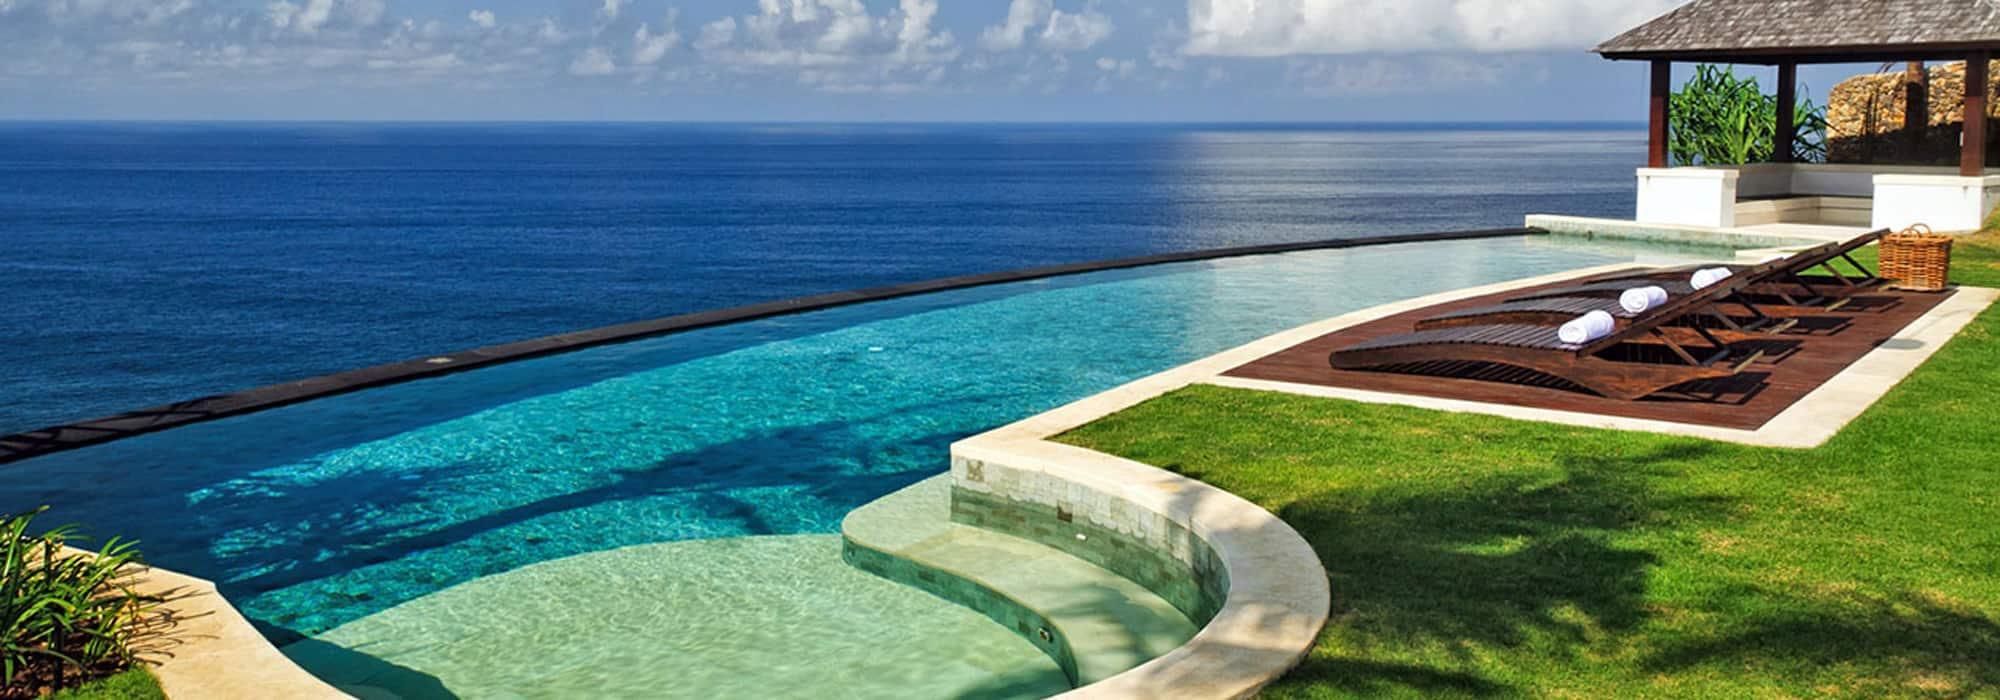 10 Bedroom Uluwatu Beachfront Villa